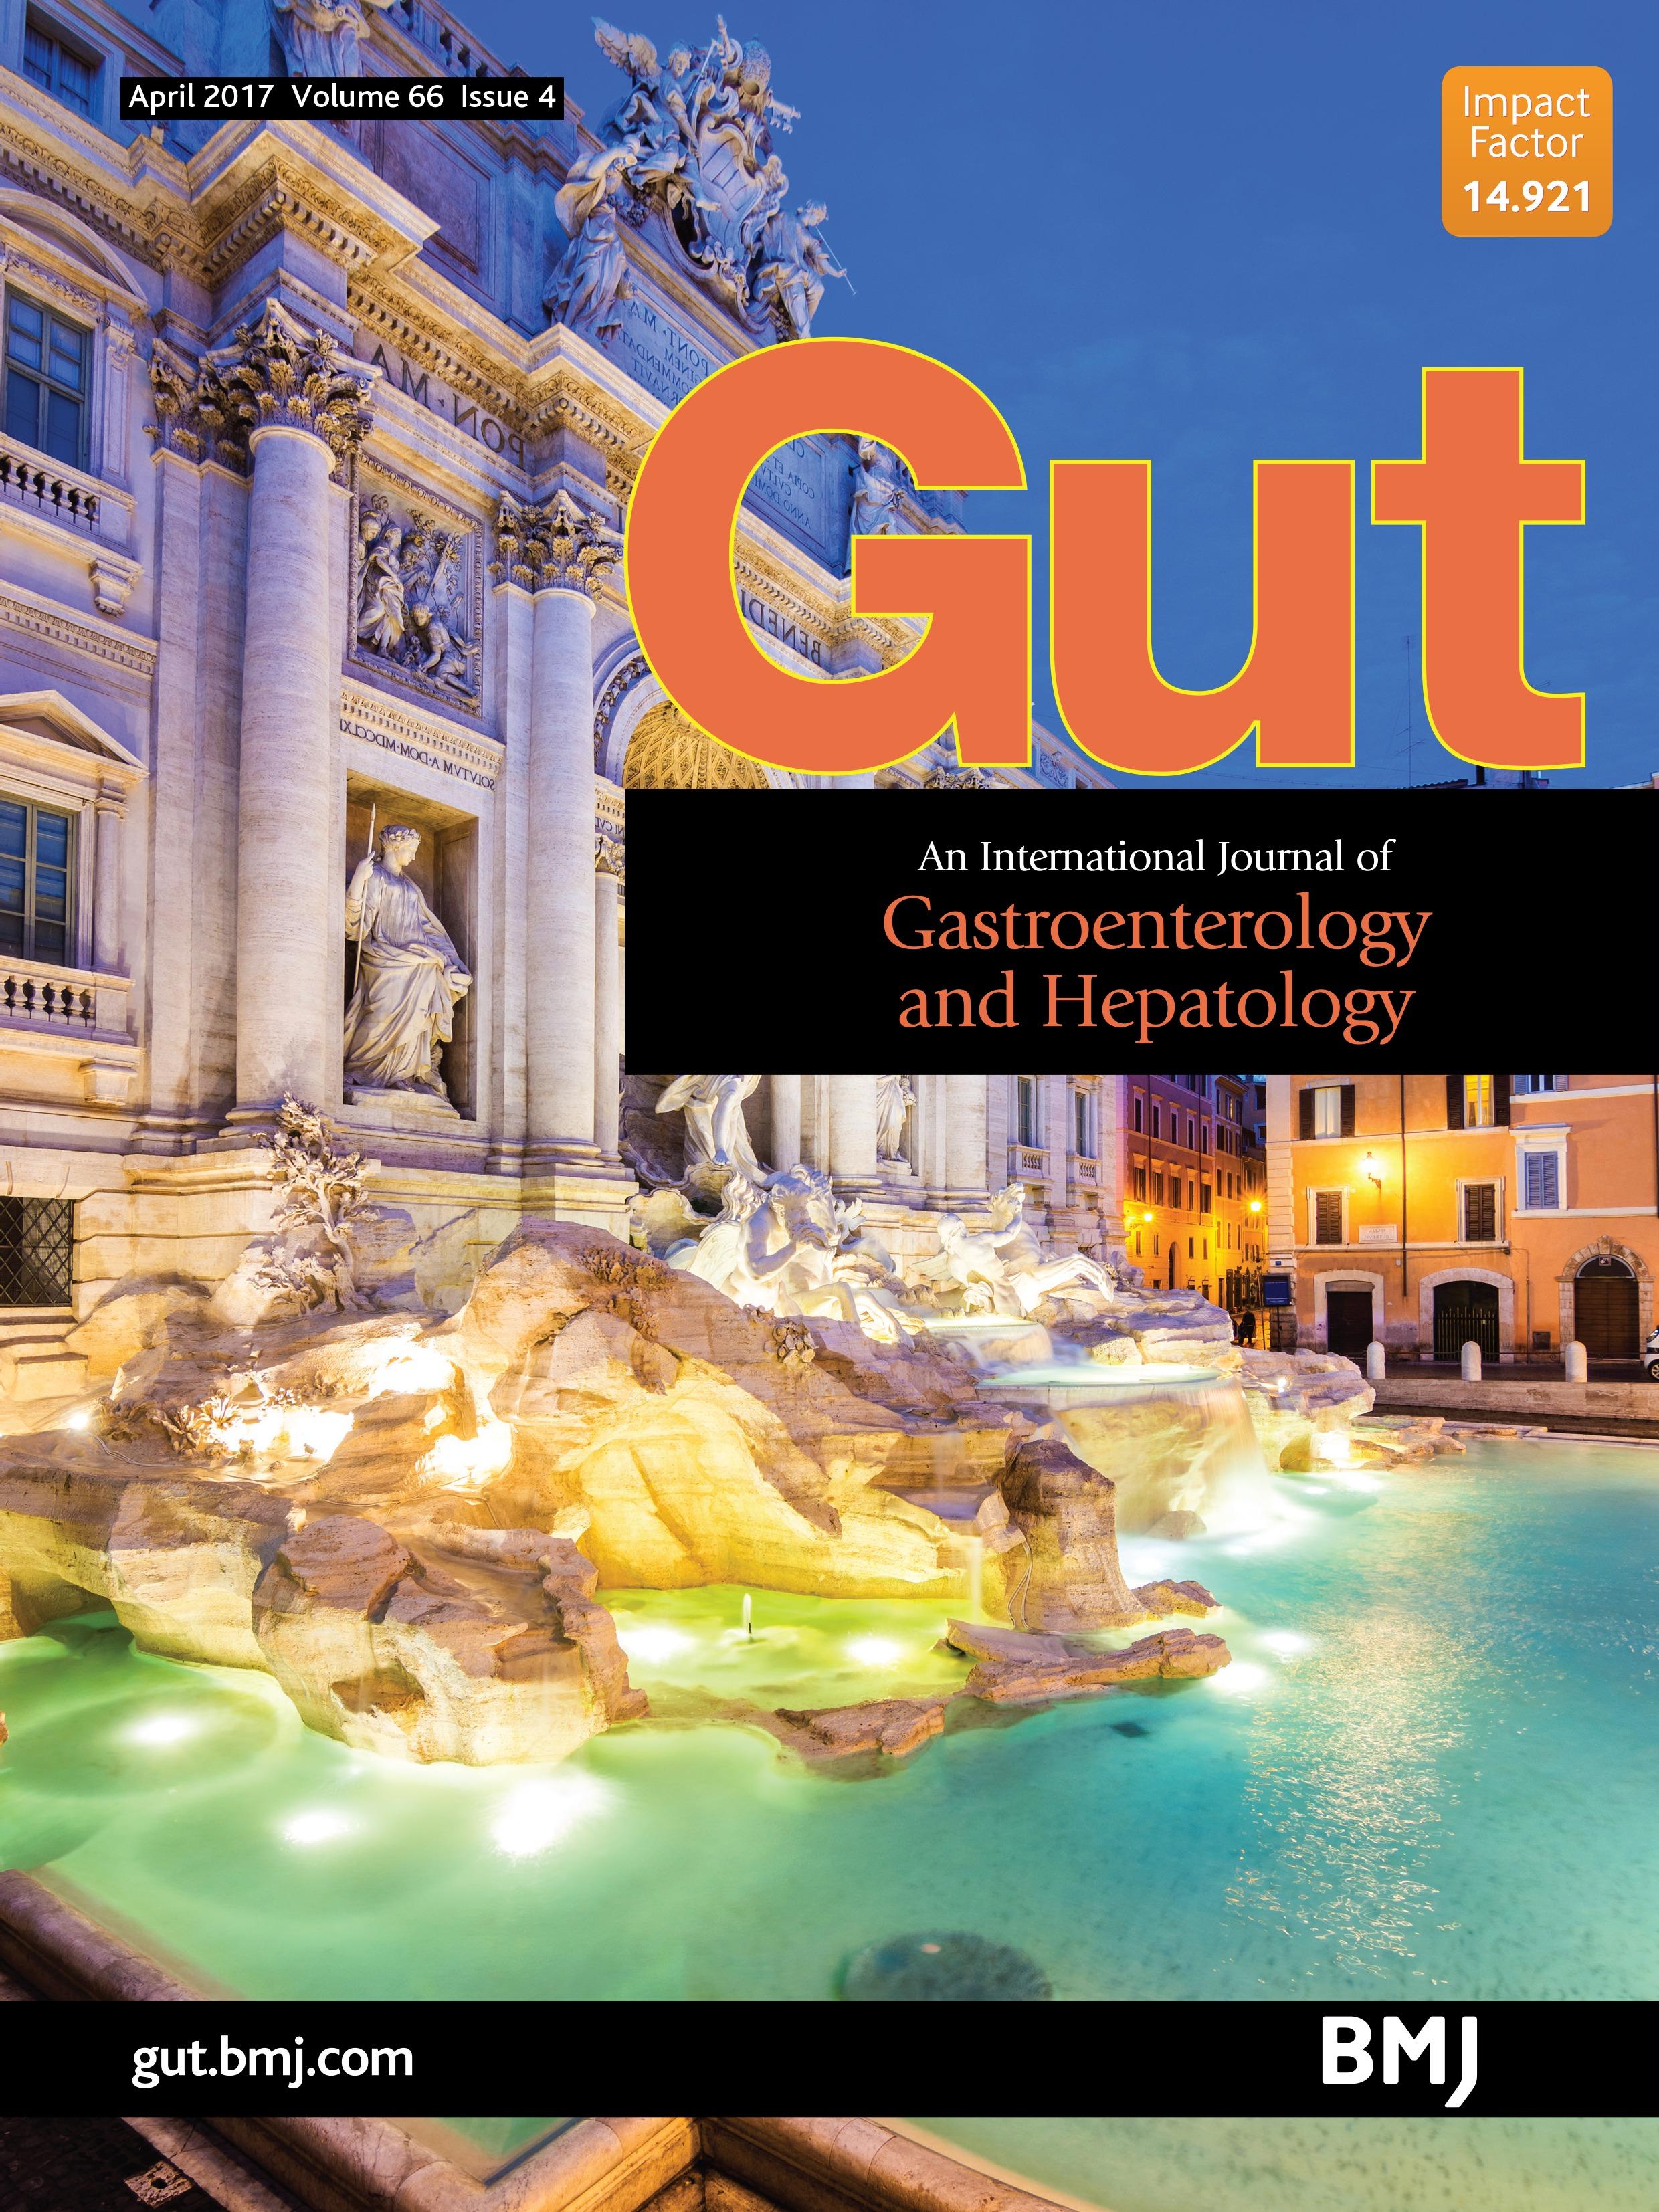 European consensus conference on faecal microbiota